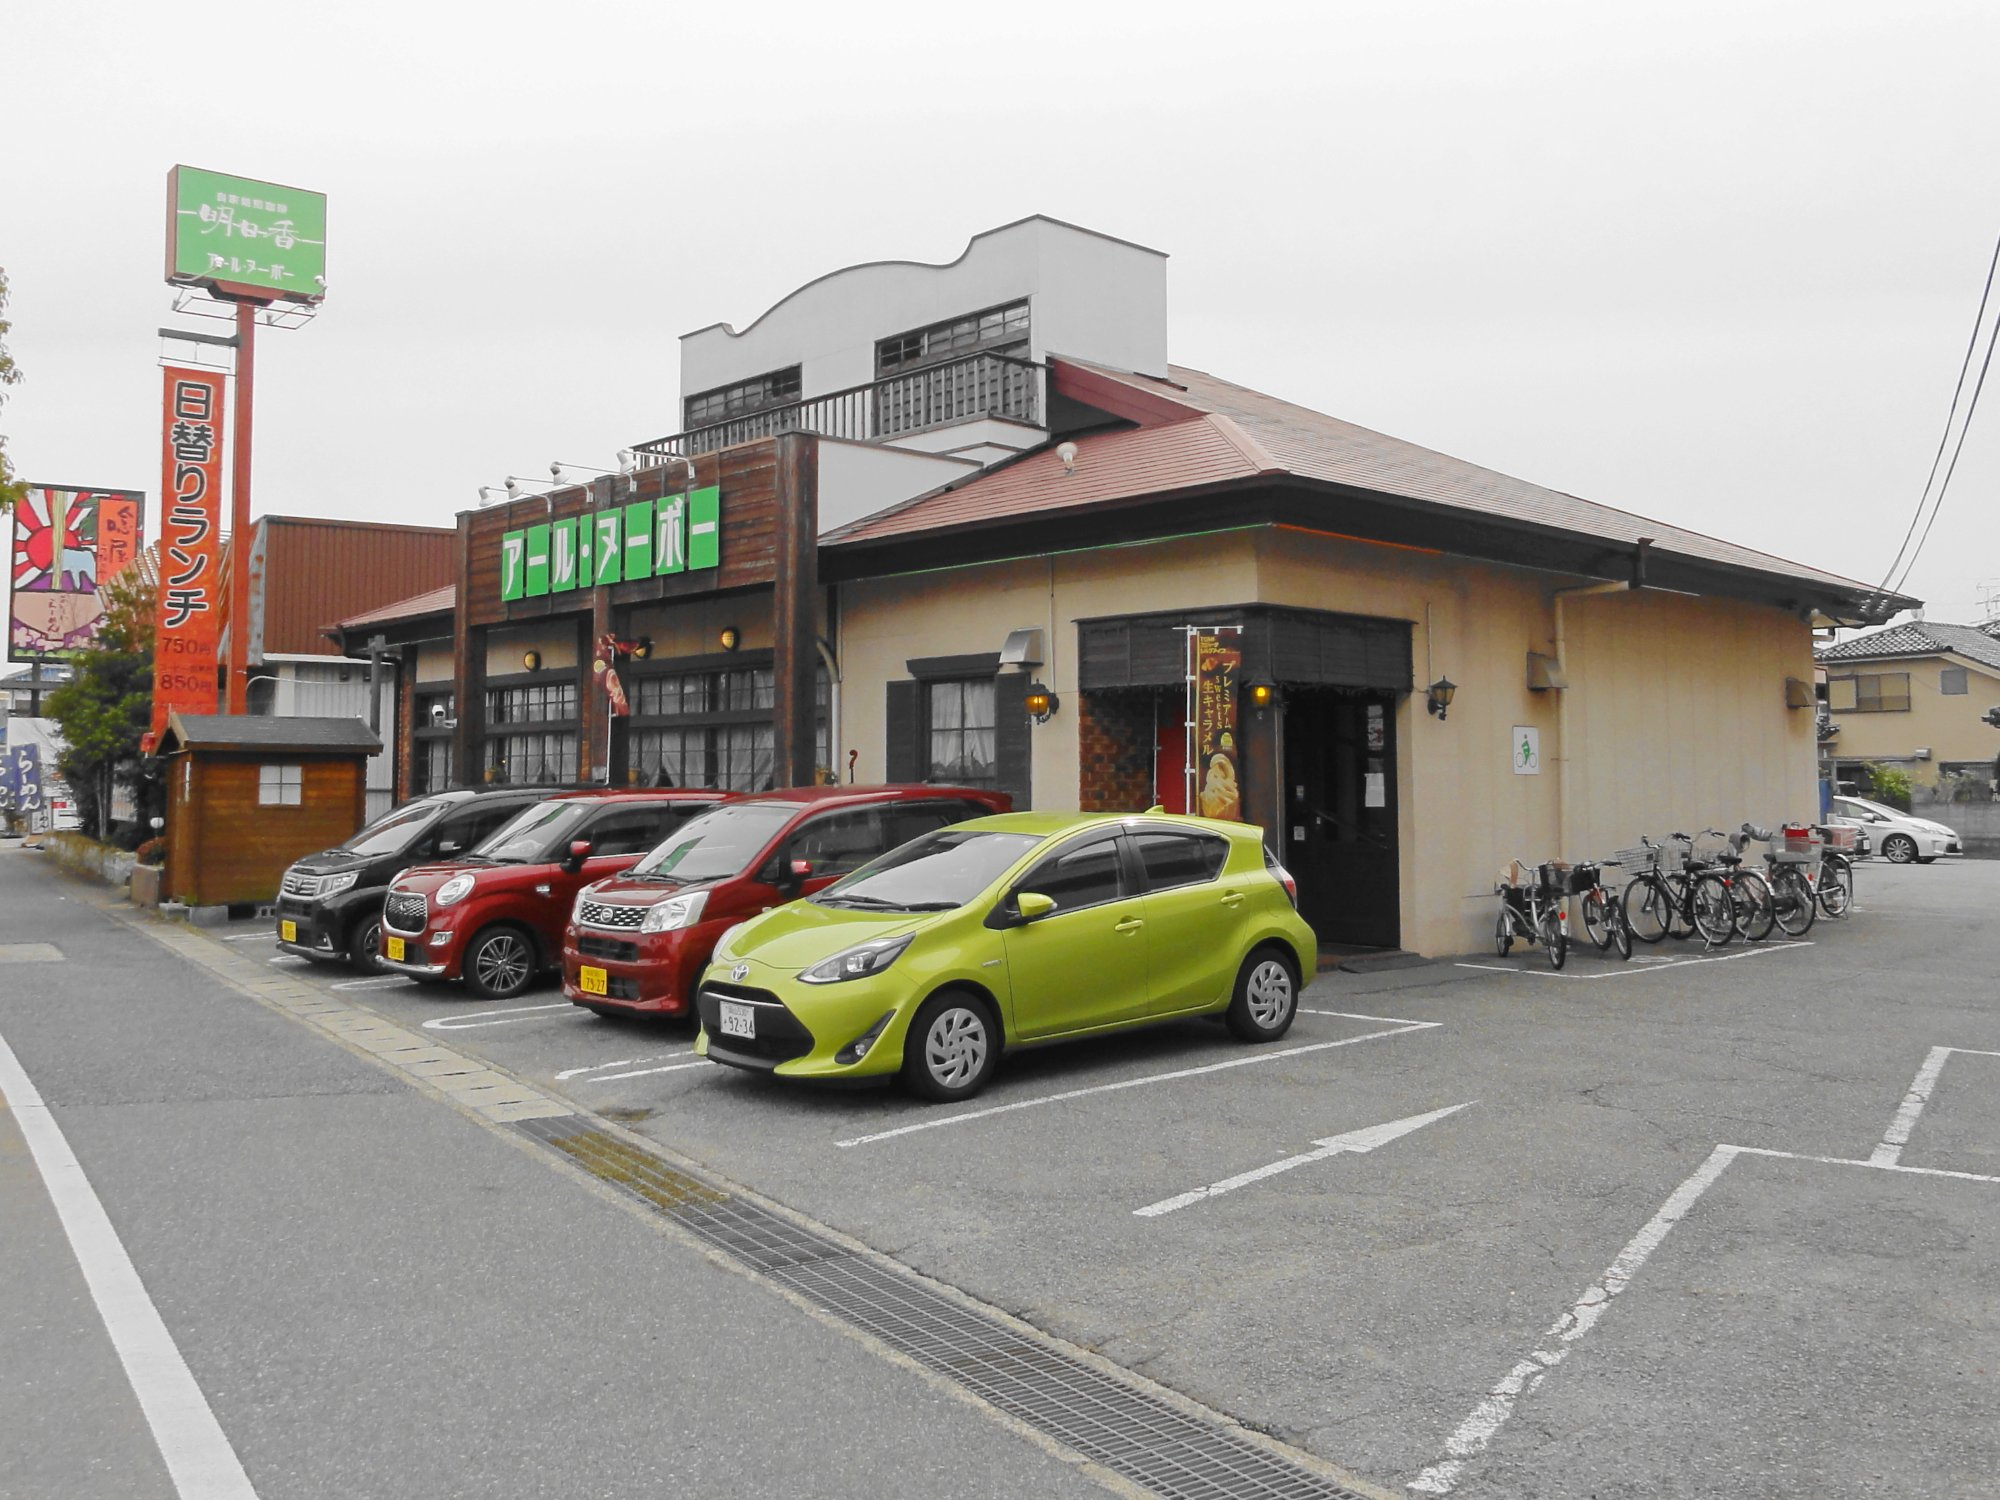 Hyogo Prefecture, Japan Food Guide: 8 International food Must-Eat Restaurants & Street Food Stalls in Harima-cho